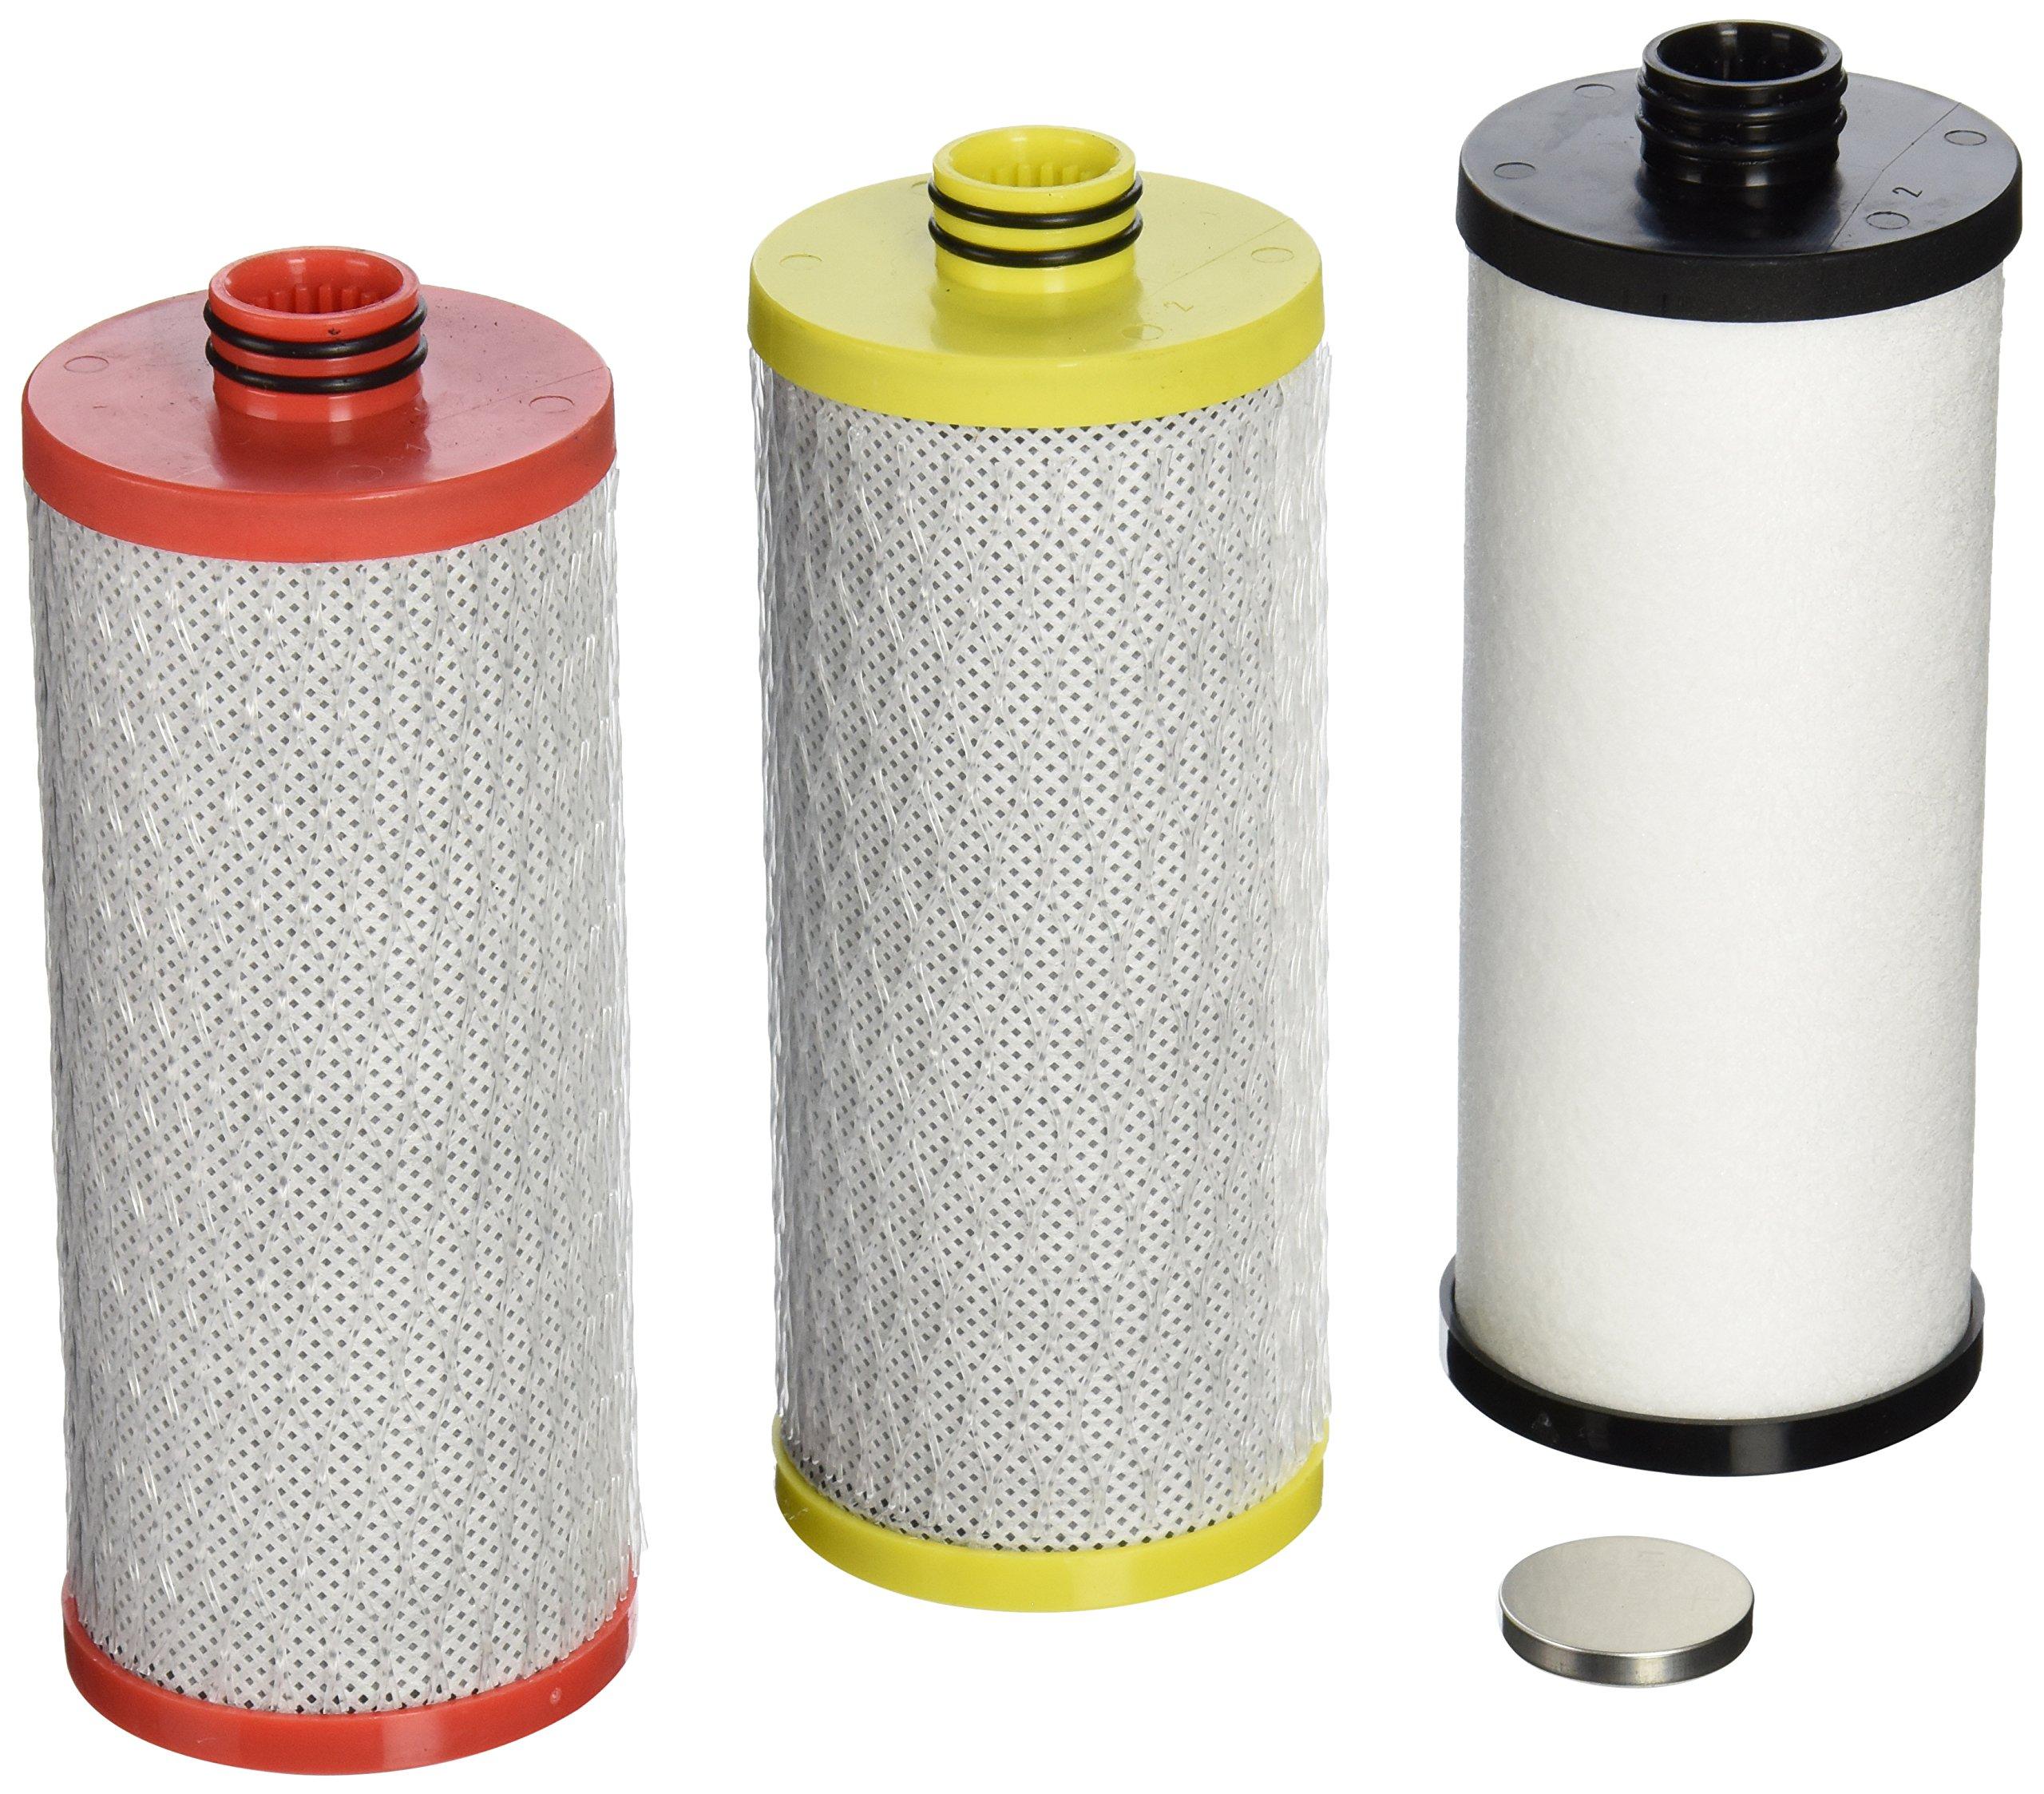 Aquasana AQ-5300R 3-Stage  Under Sink Water Filter Replacement Cartridges by Aquasana